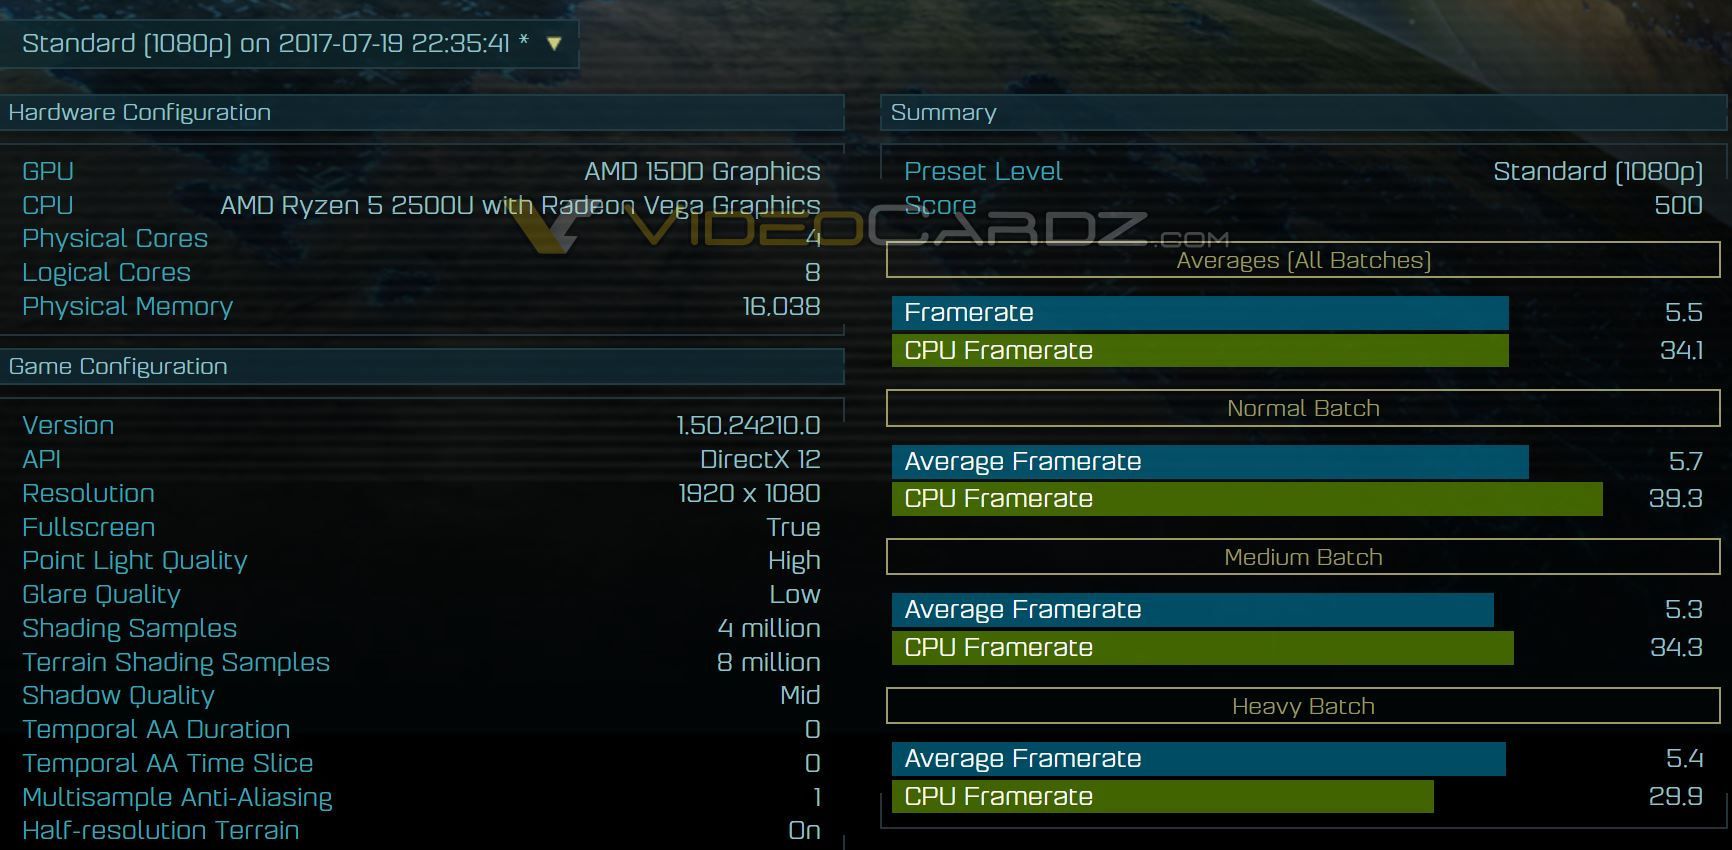 AMD Ryzen 5 2500U with Radeon Vega Graphics spotted